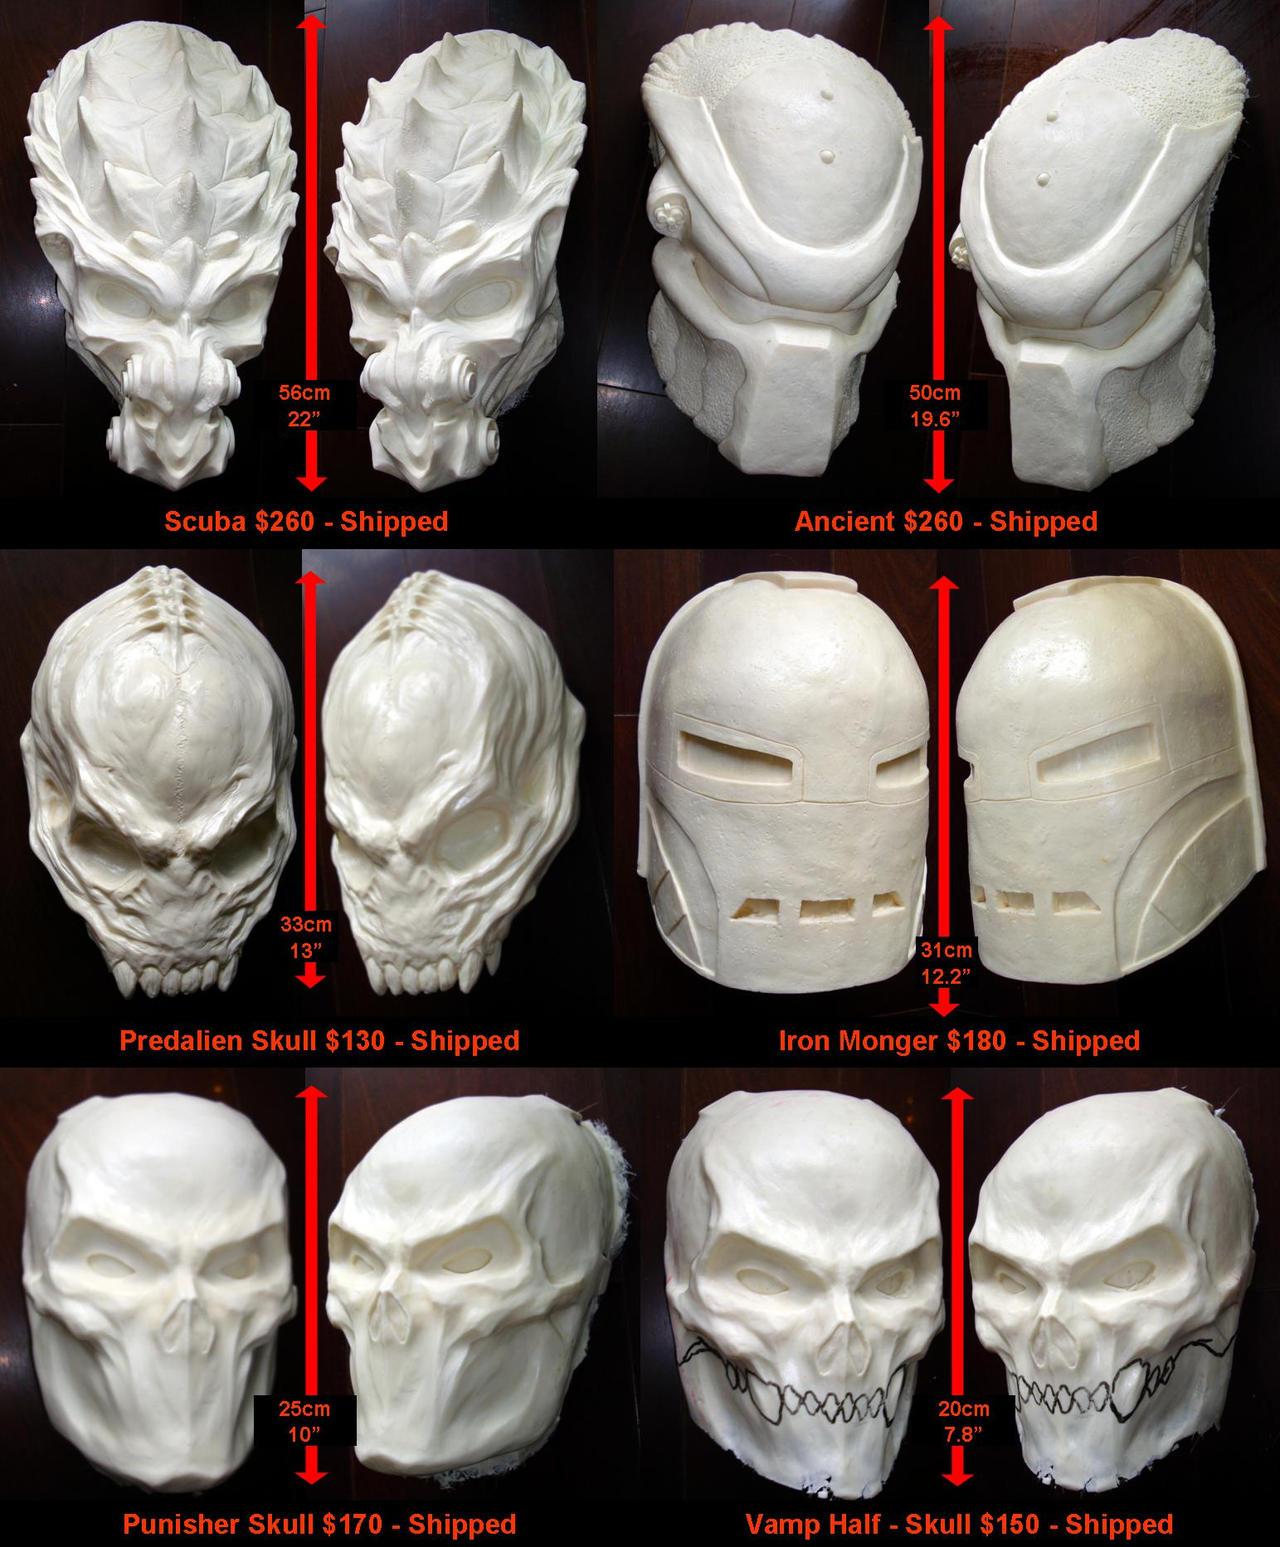 Mask sale blanks by uratz studios on deviantart - Uratz studios ...